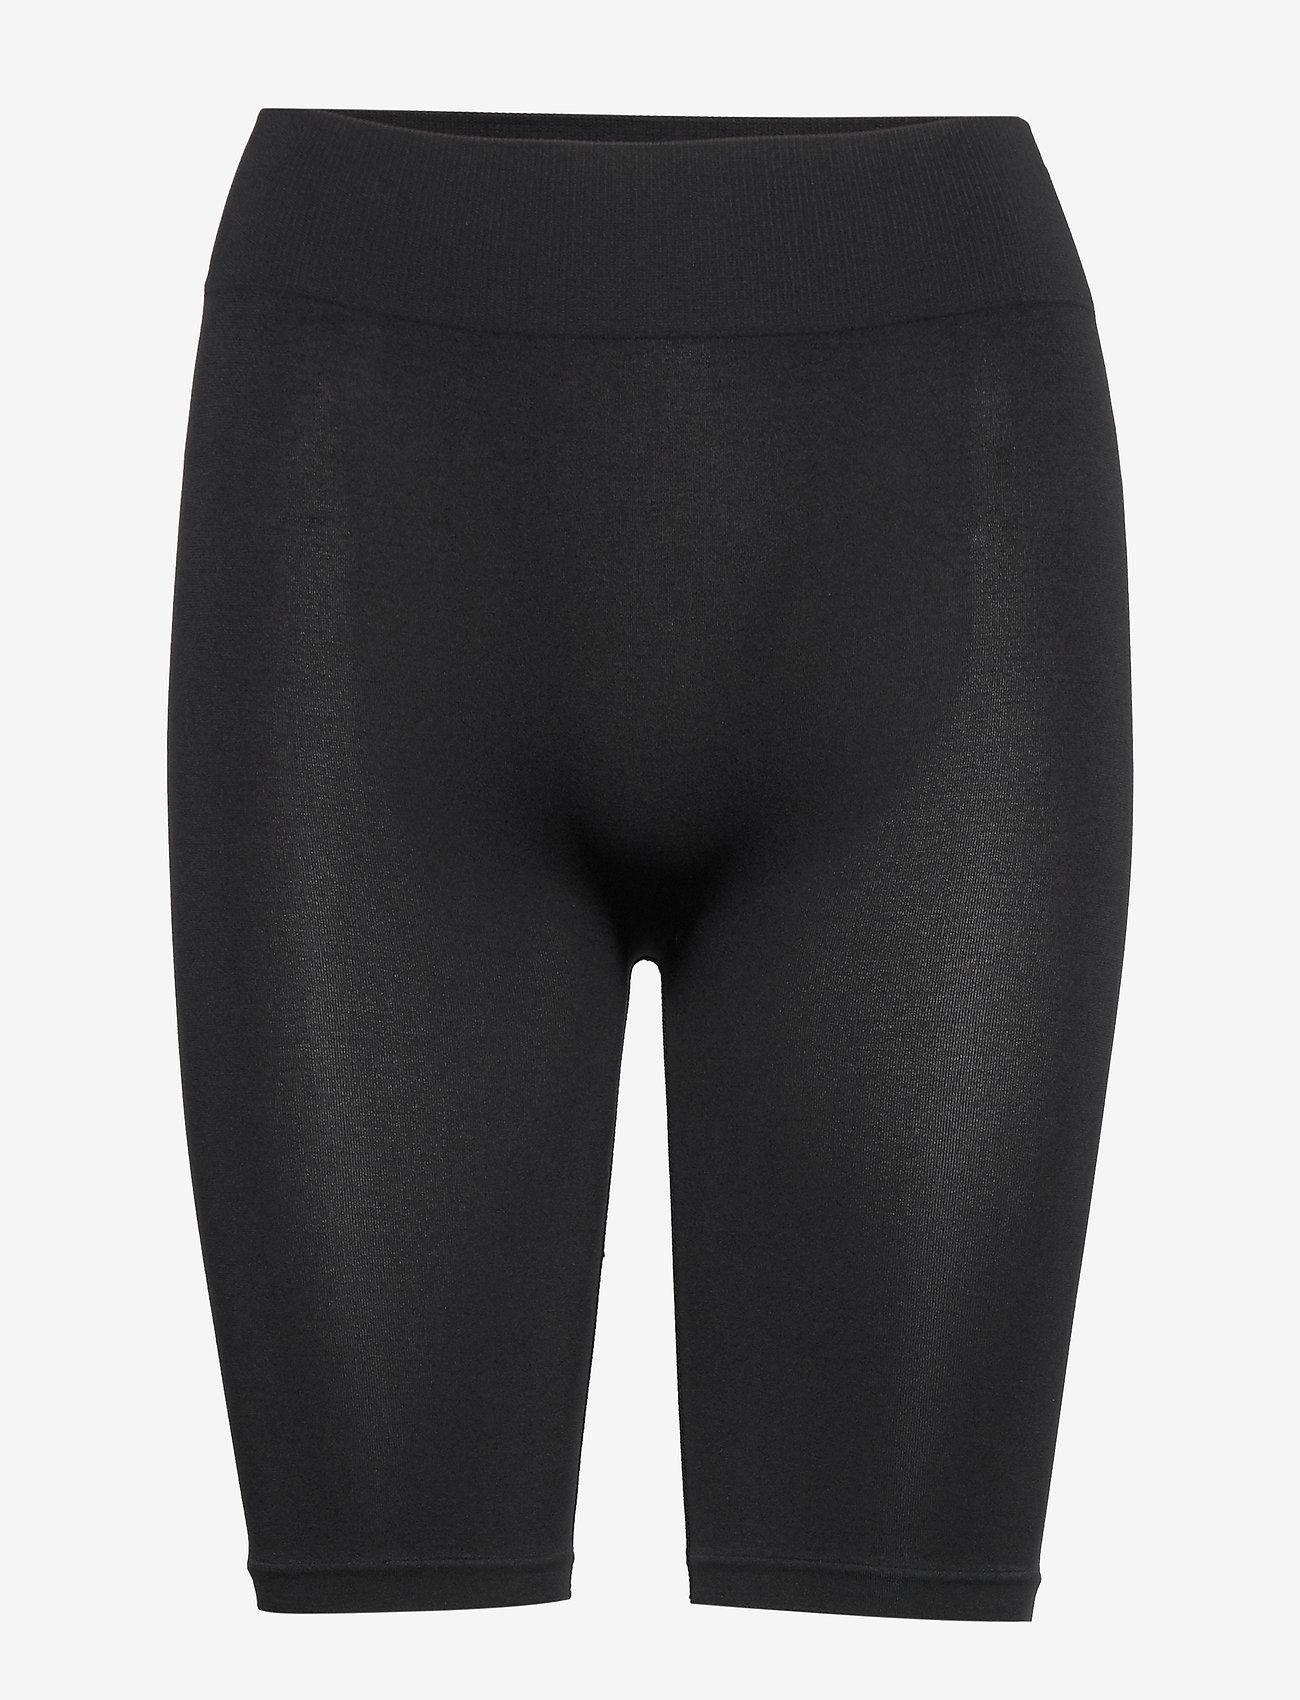 Minus - Mira shorts - cykelshorts - sort - 0